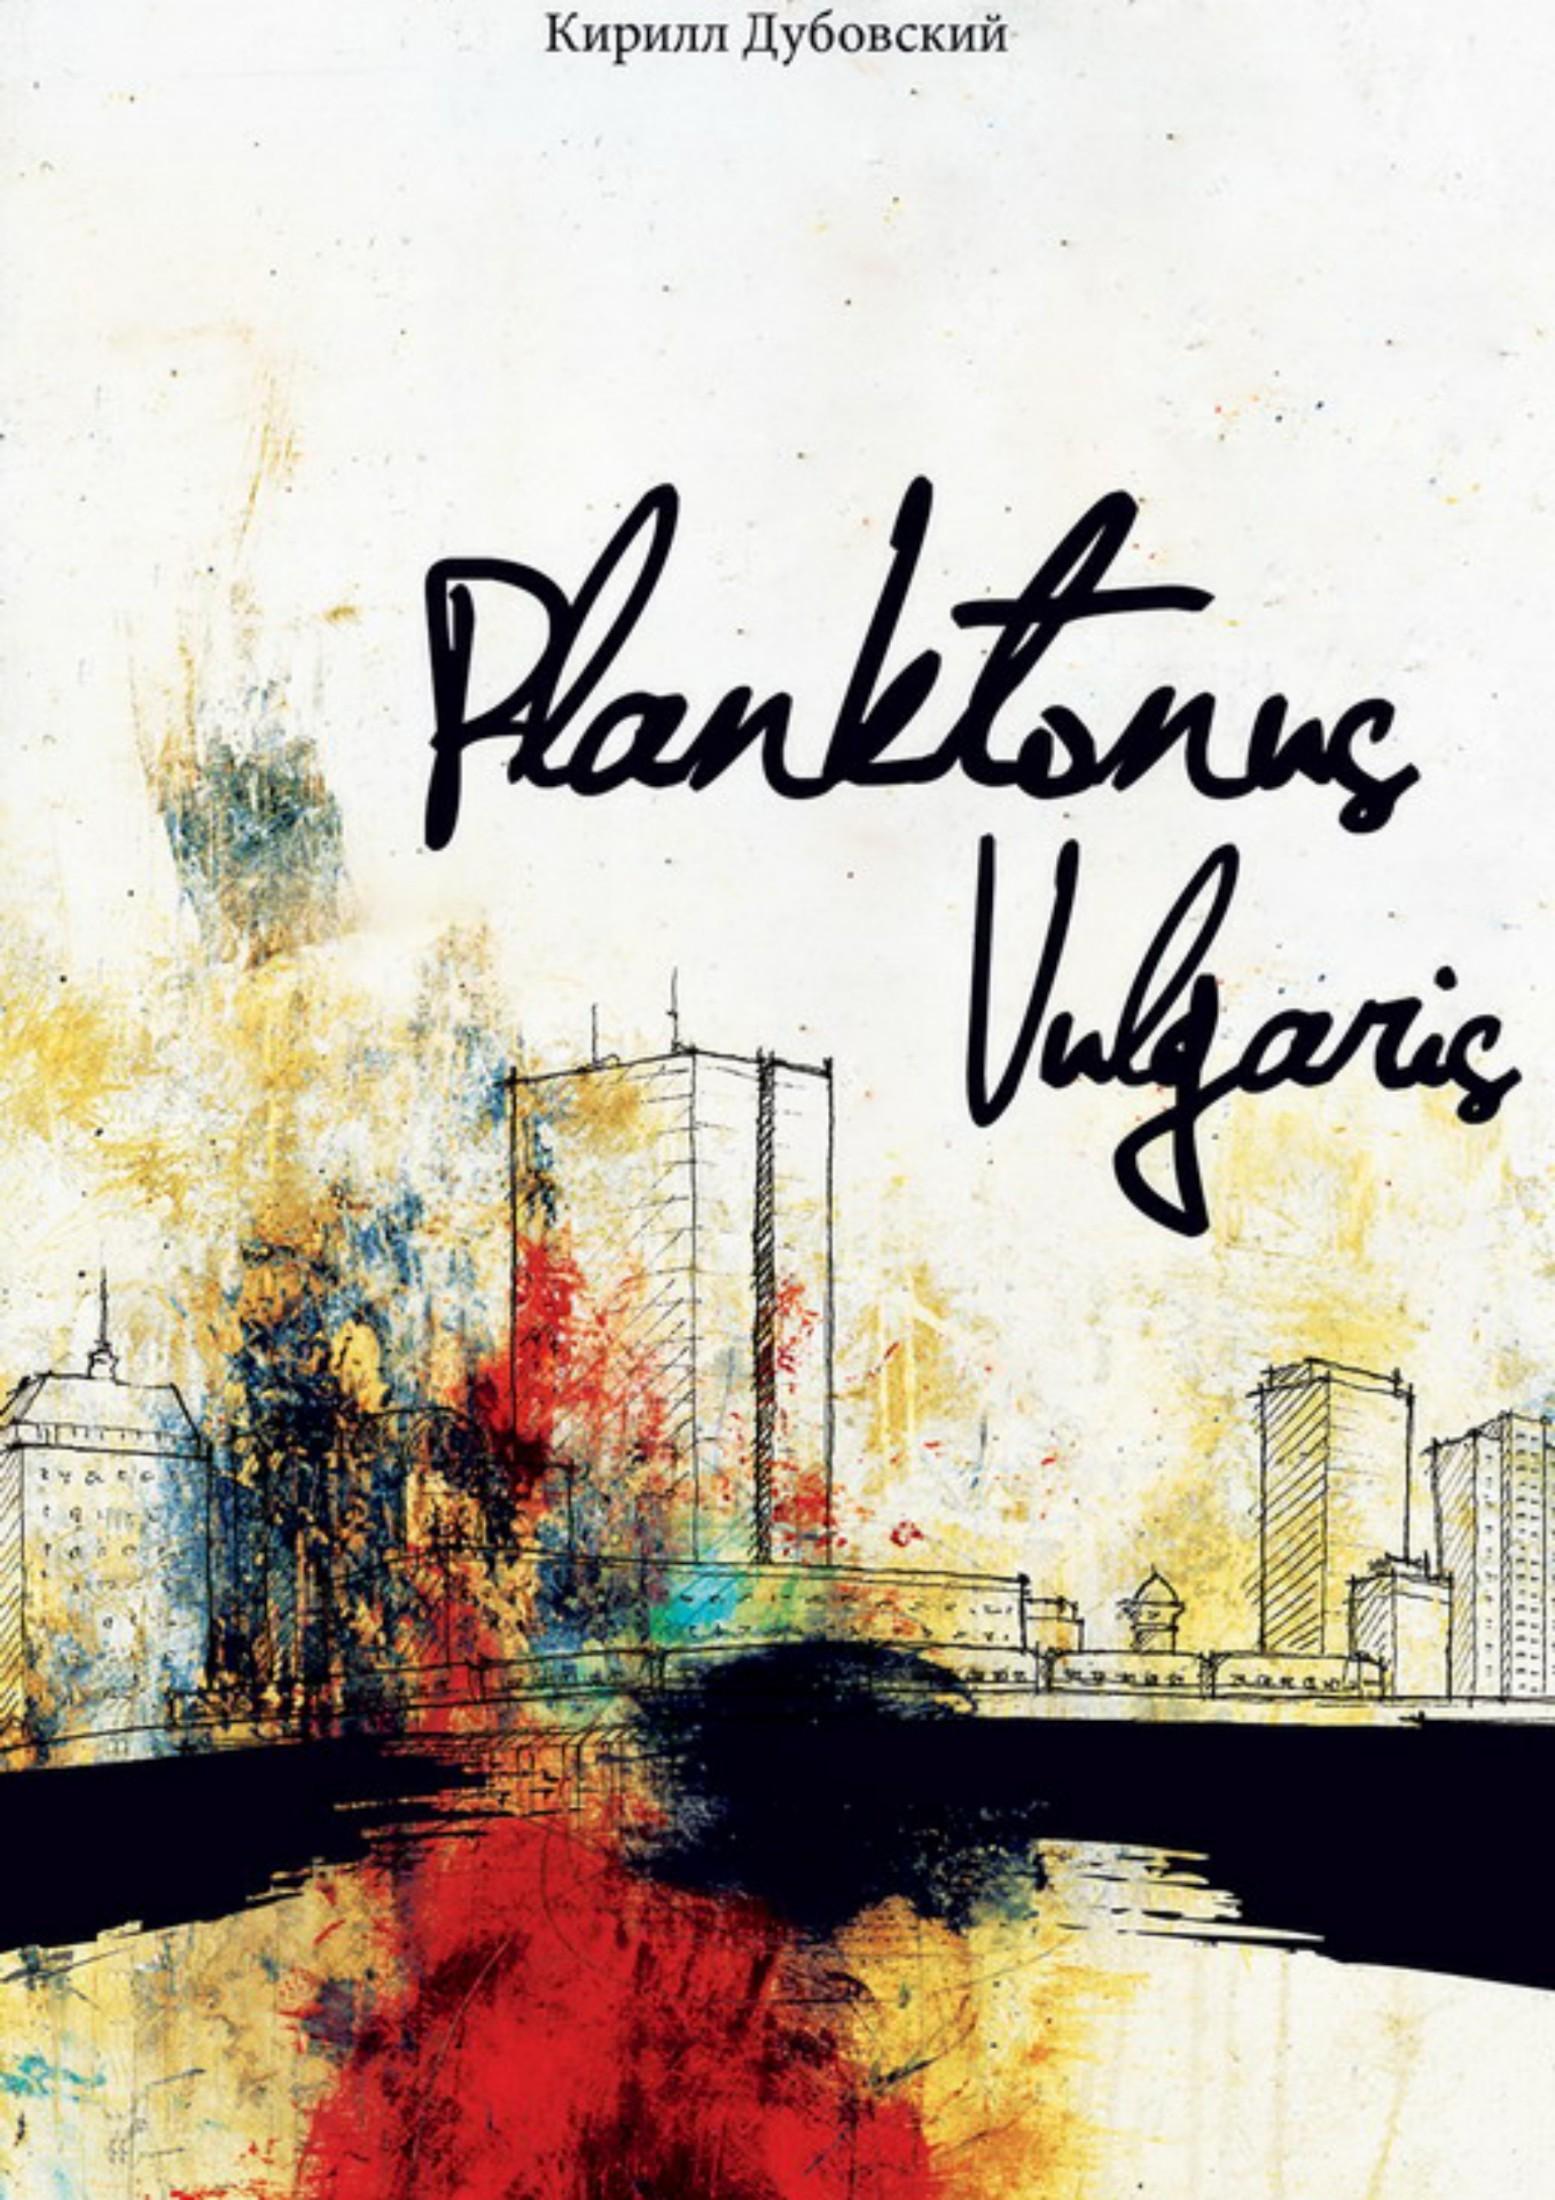 Planktonus Vulgaris